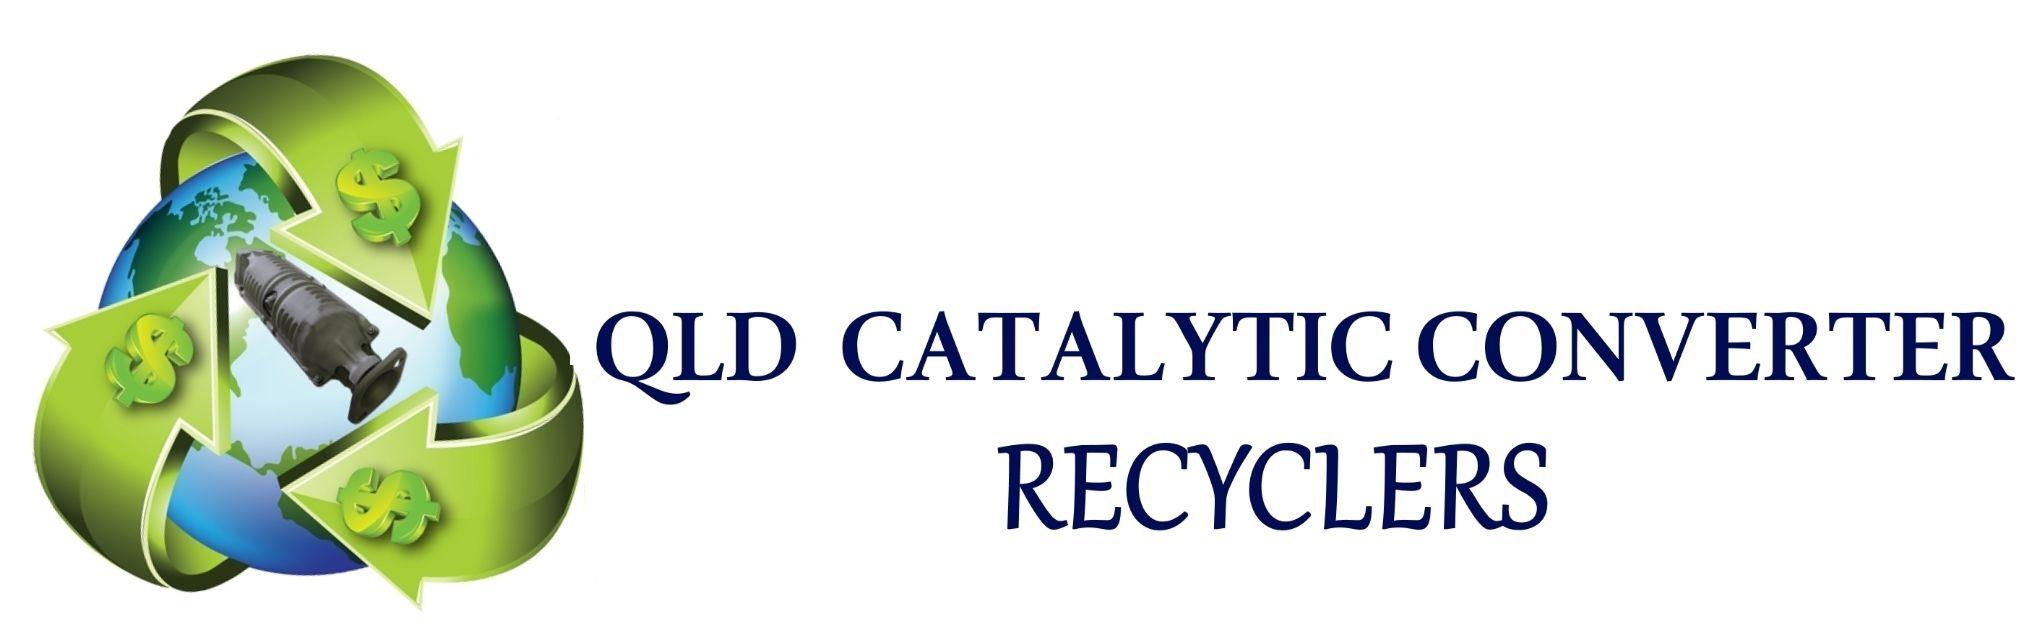 The qldcatconverter's Podcast Converter, Recycling